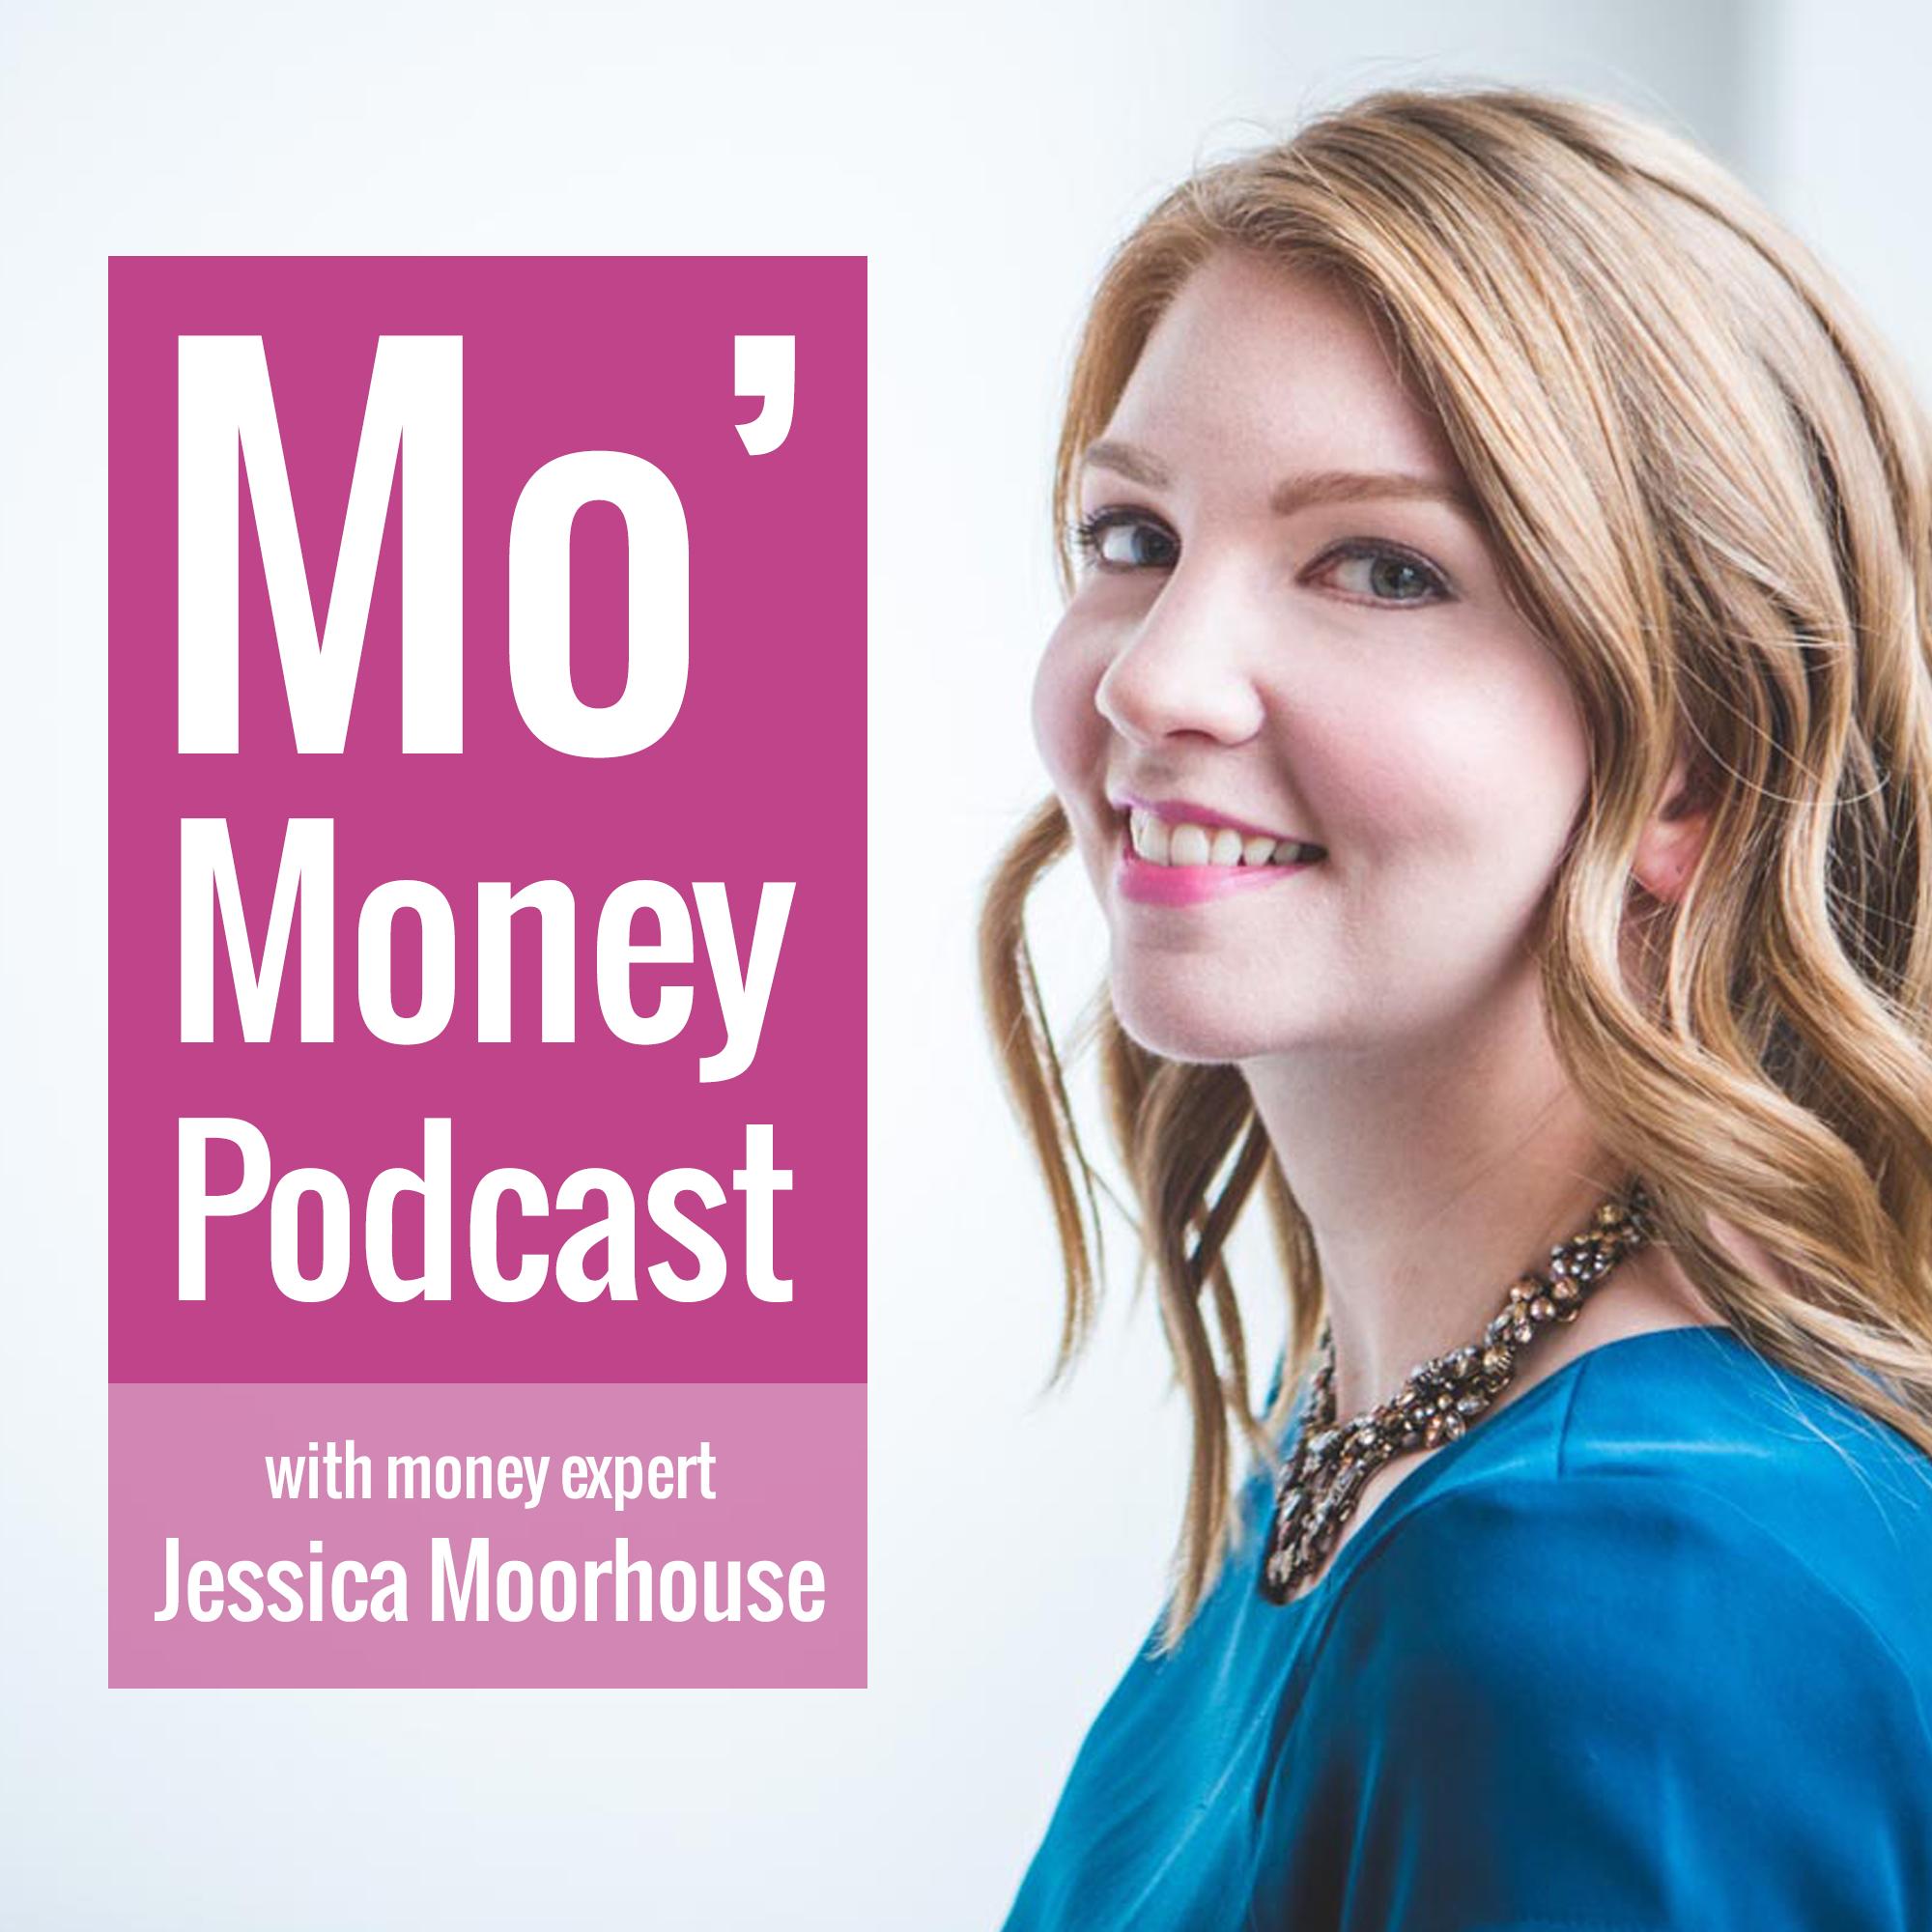 Mo' Money podcast logo